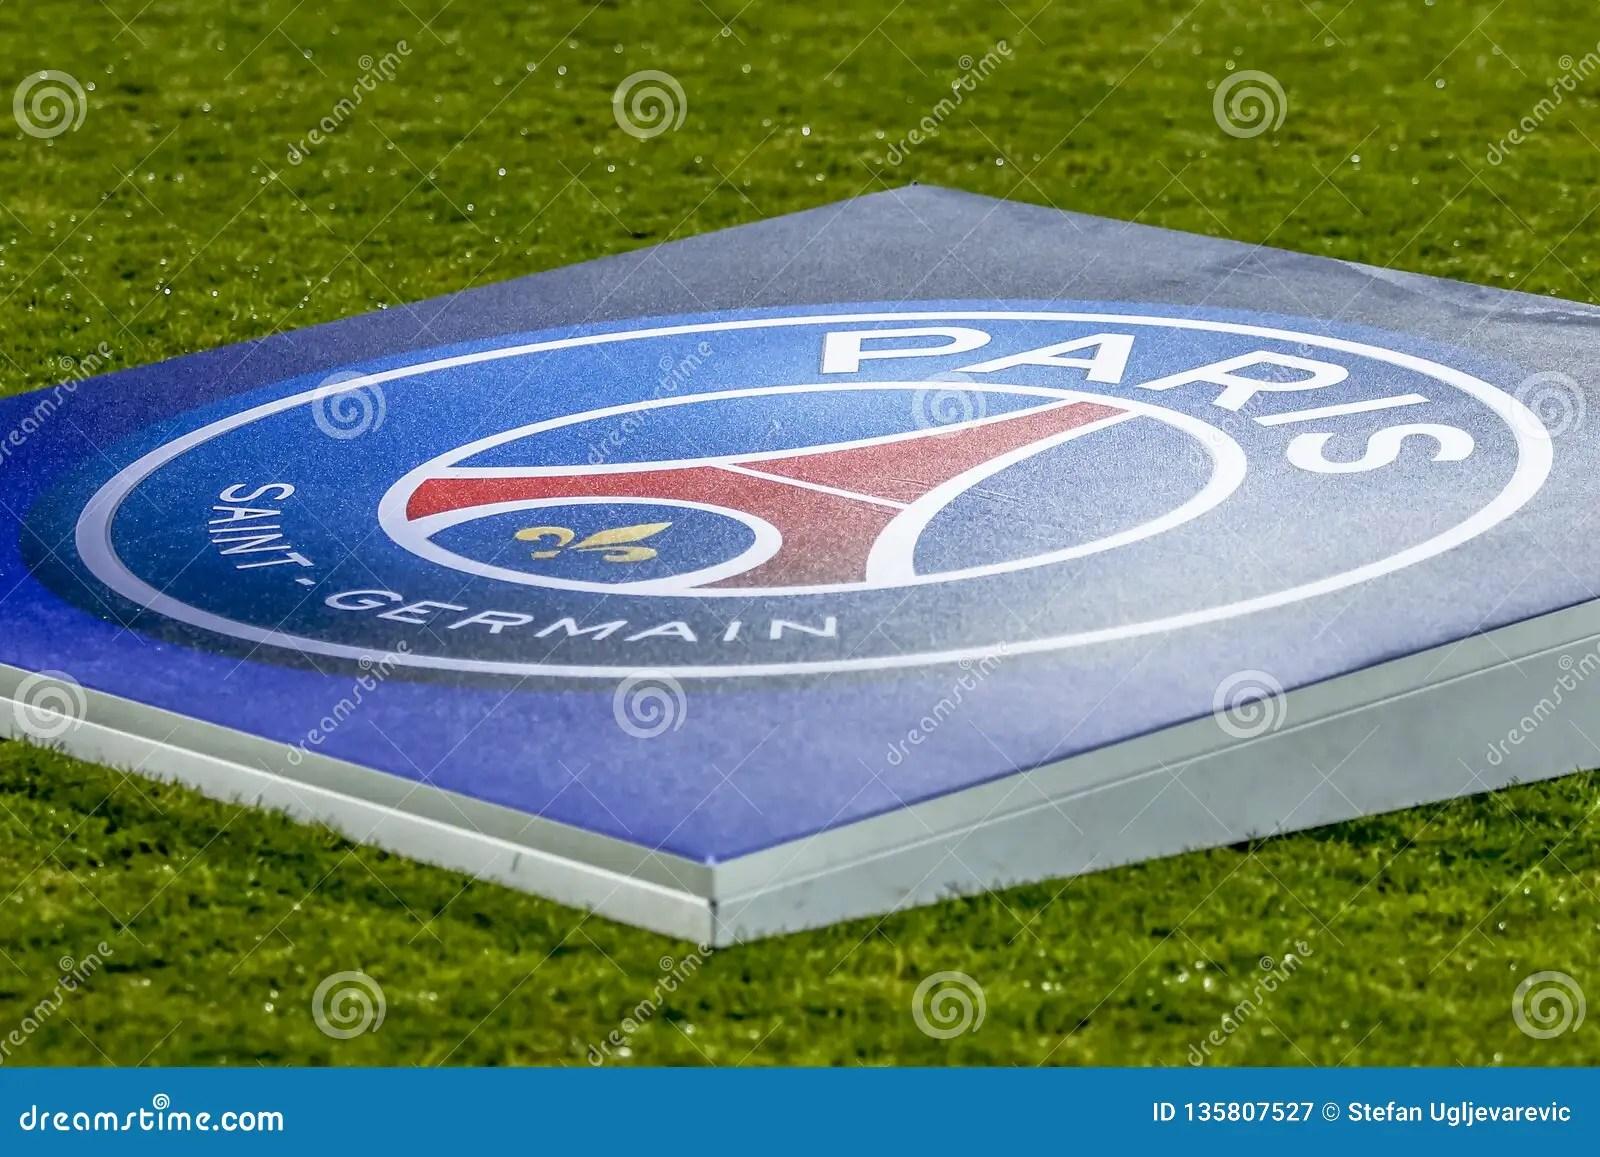 https www dreamstime com psg team logo football field belgrade serbia december up uefa champions league match red star vs paris saint germain image135807527